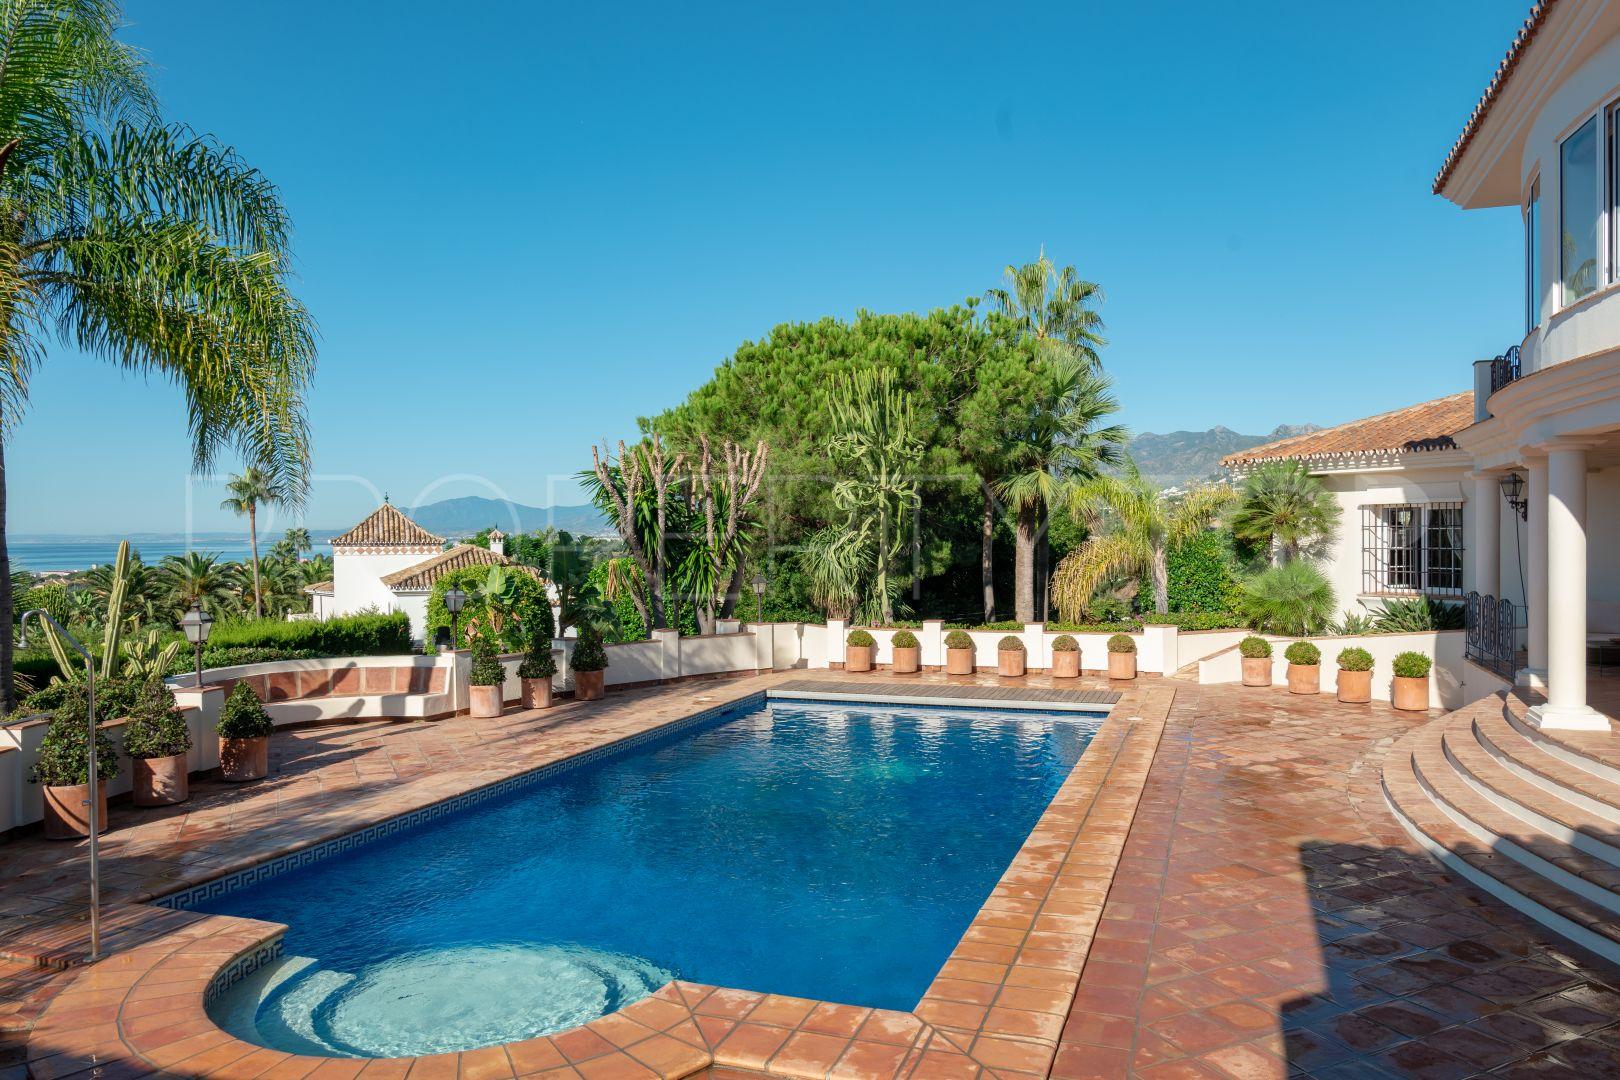 Elviria 4 bedrooms house for sale | Agnes Inversiones